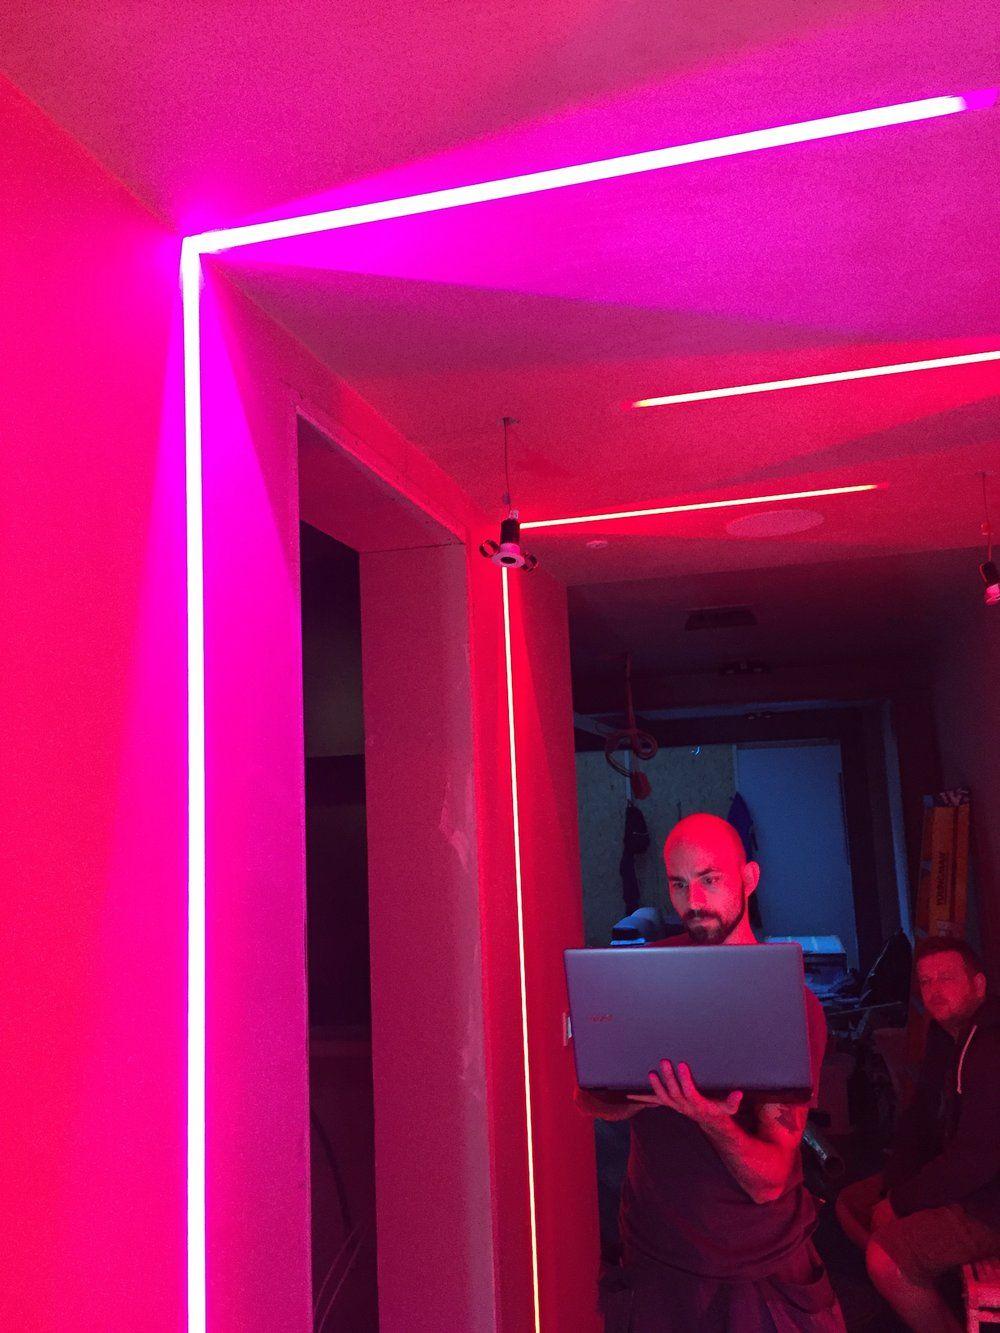 Led Lights Cozydecorshop Com Tiktok Led Rgb Strip Lights Color Changing Led Lights Led Strip Lighting Led Color Changing Lights Strip Lighting